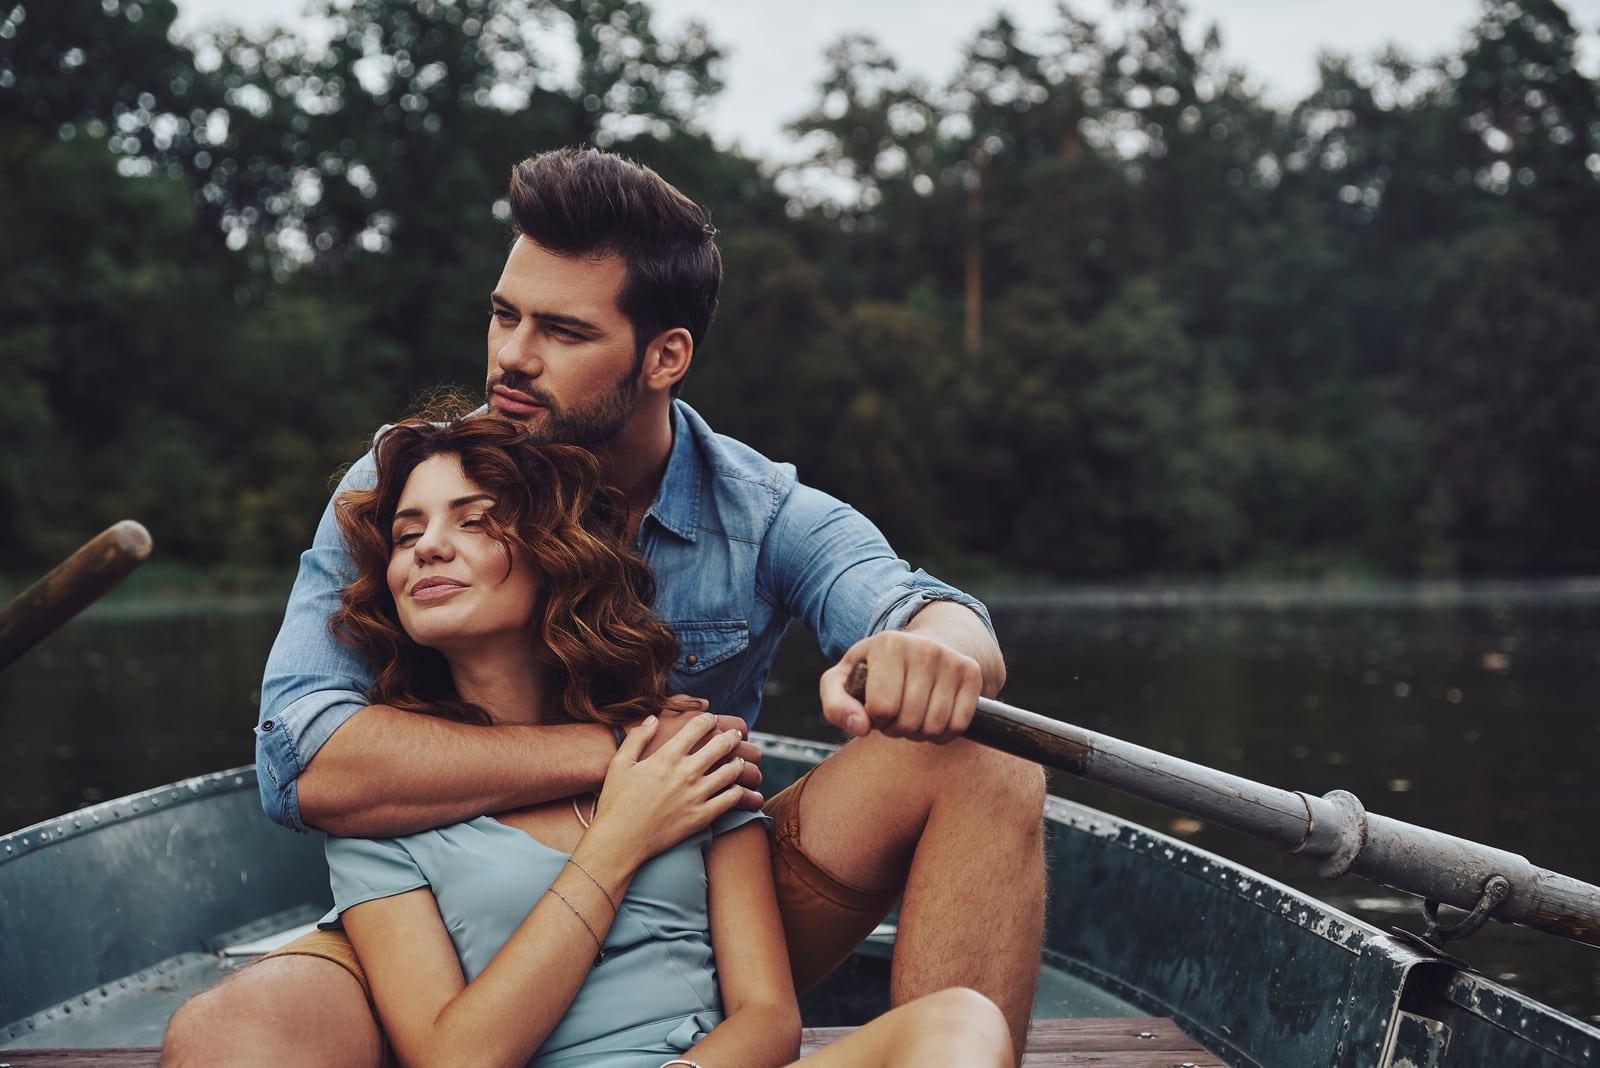 couple enjoying romantic date on the lake